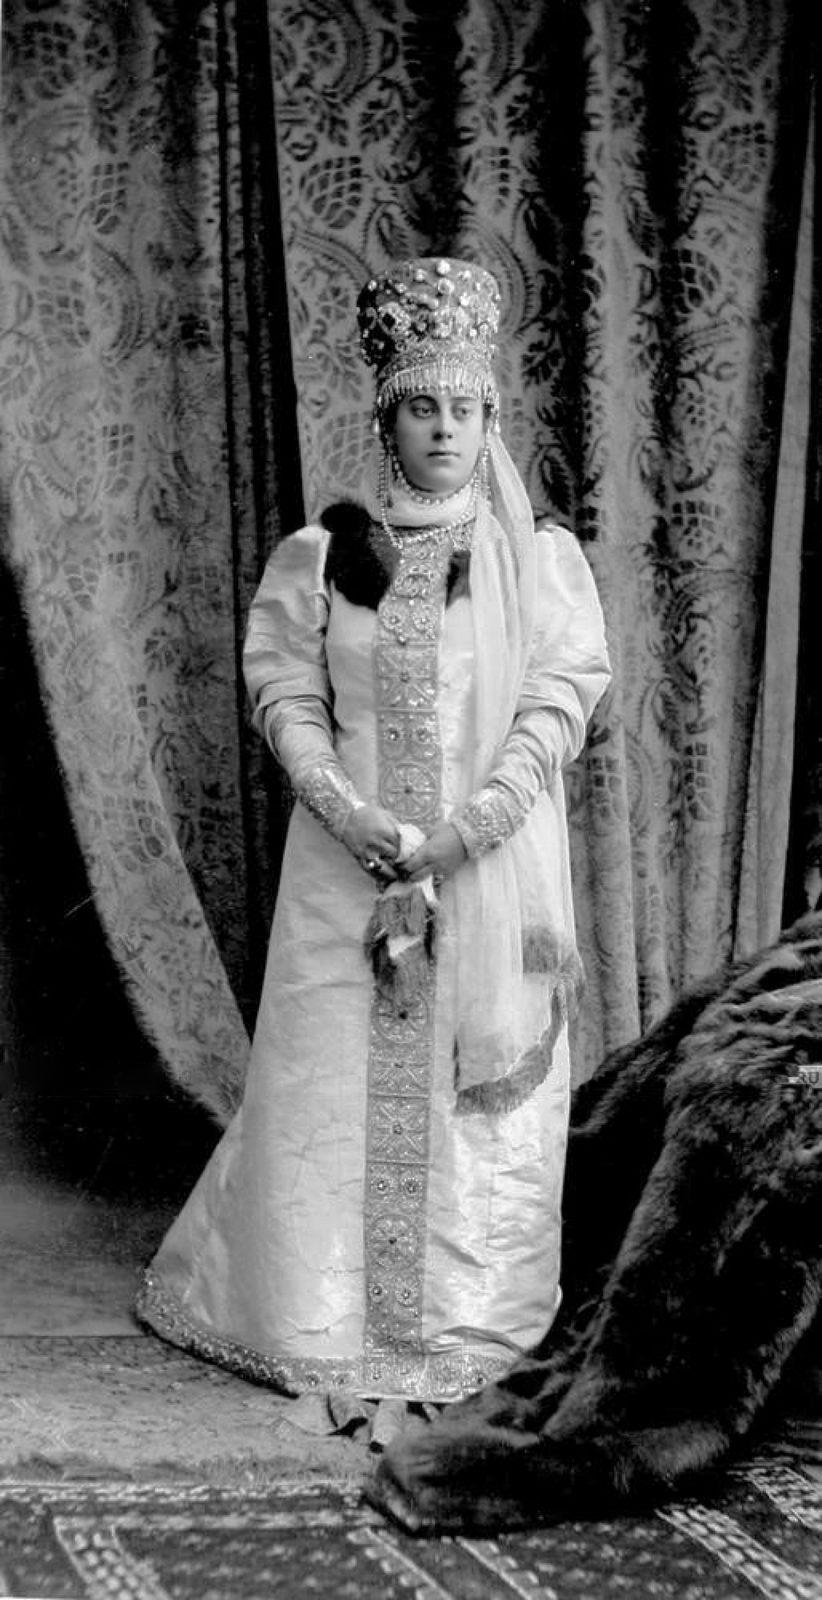 Countess Mariya Mikhailovna Orlova-Davydova, born Zografo (Boyarynya of the XVII century)